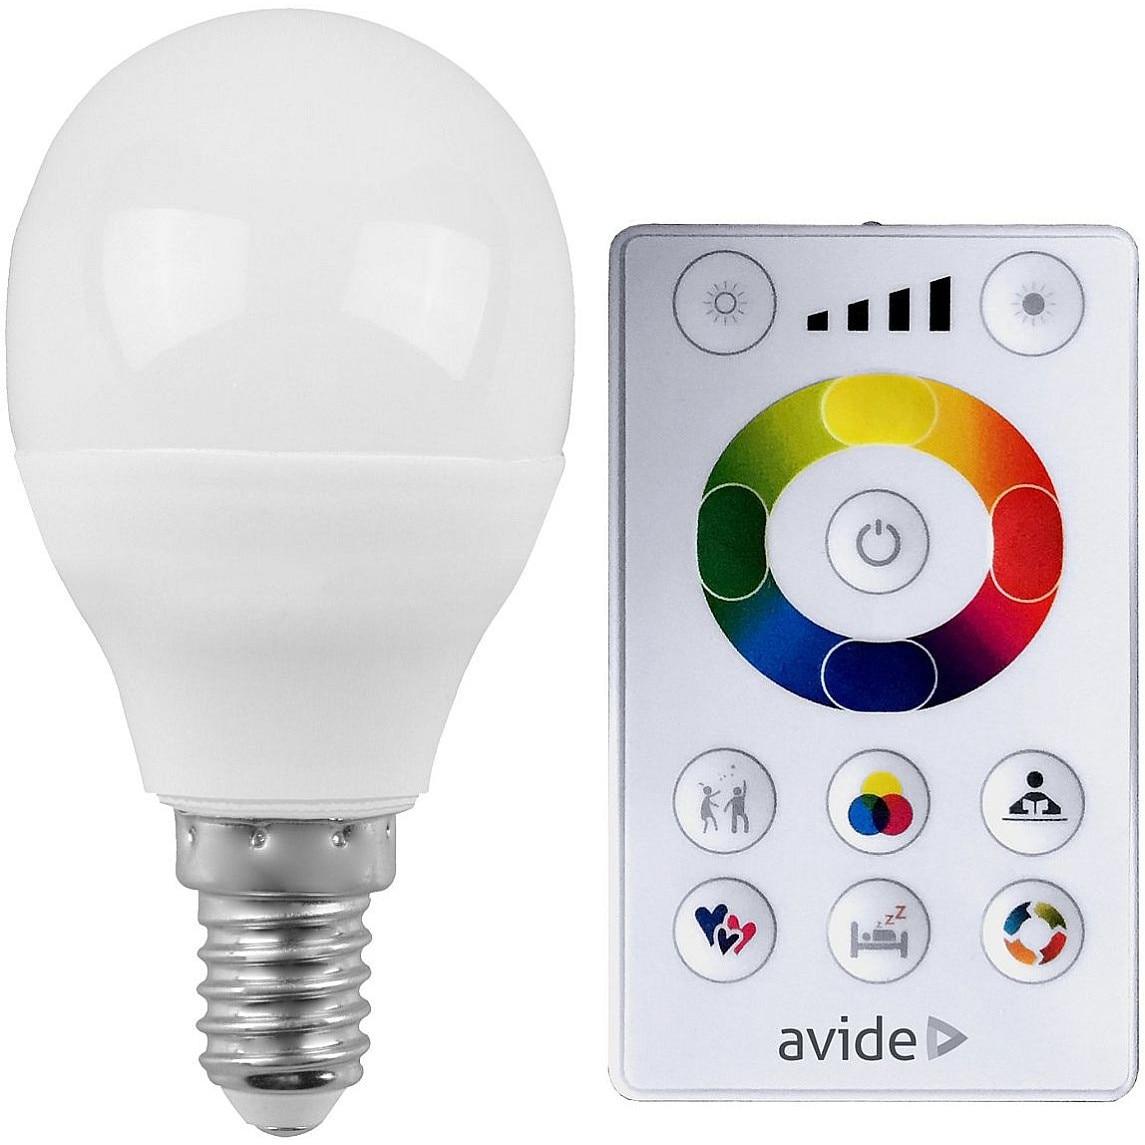 Bec Avide Smart LED bec Mini 5.5W RGB+W 2700K cu telecomanda IR